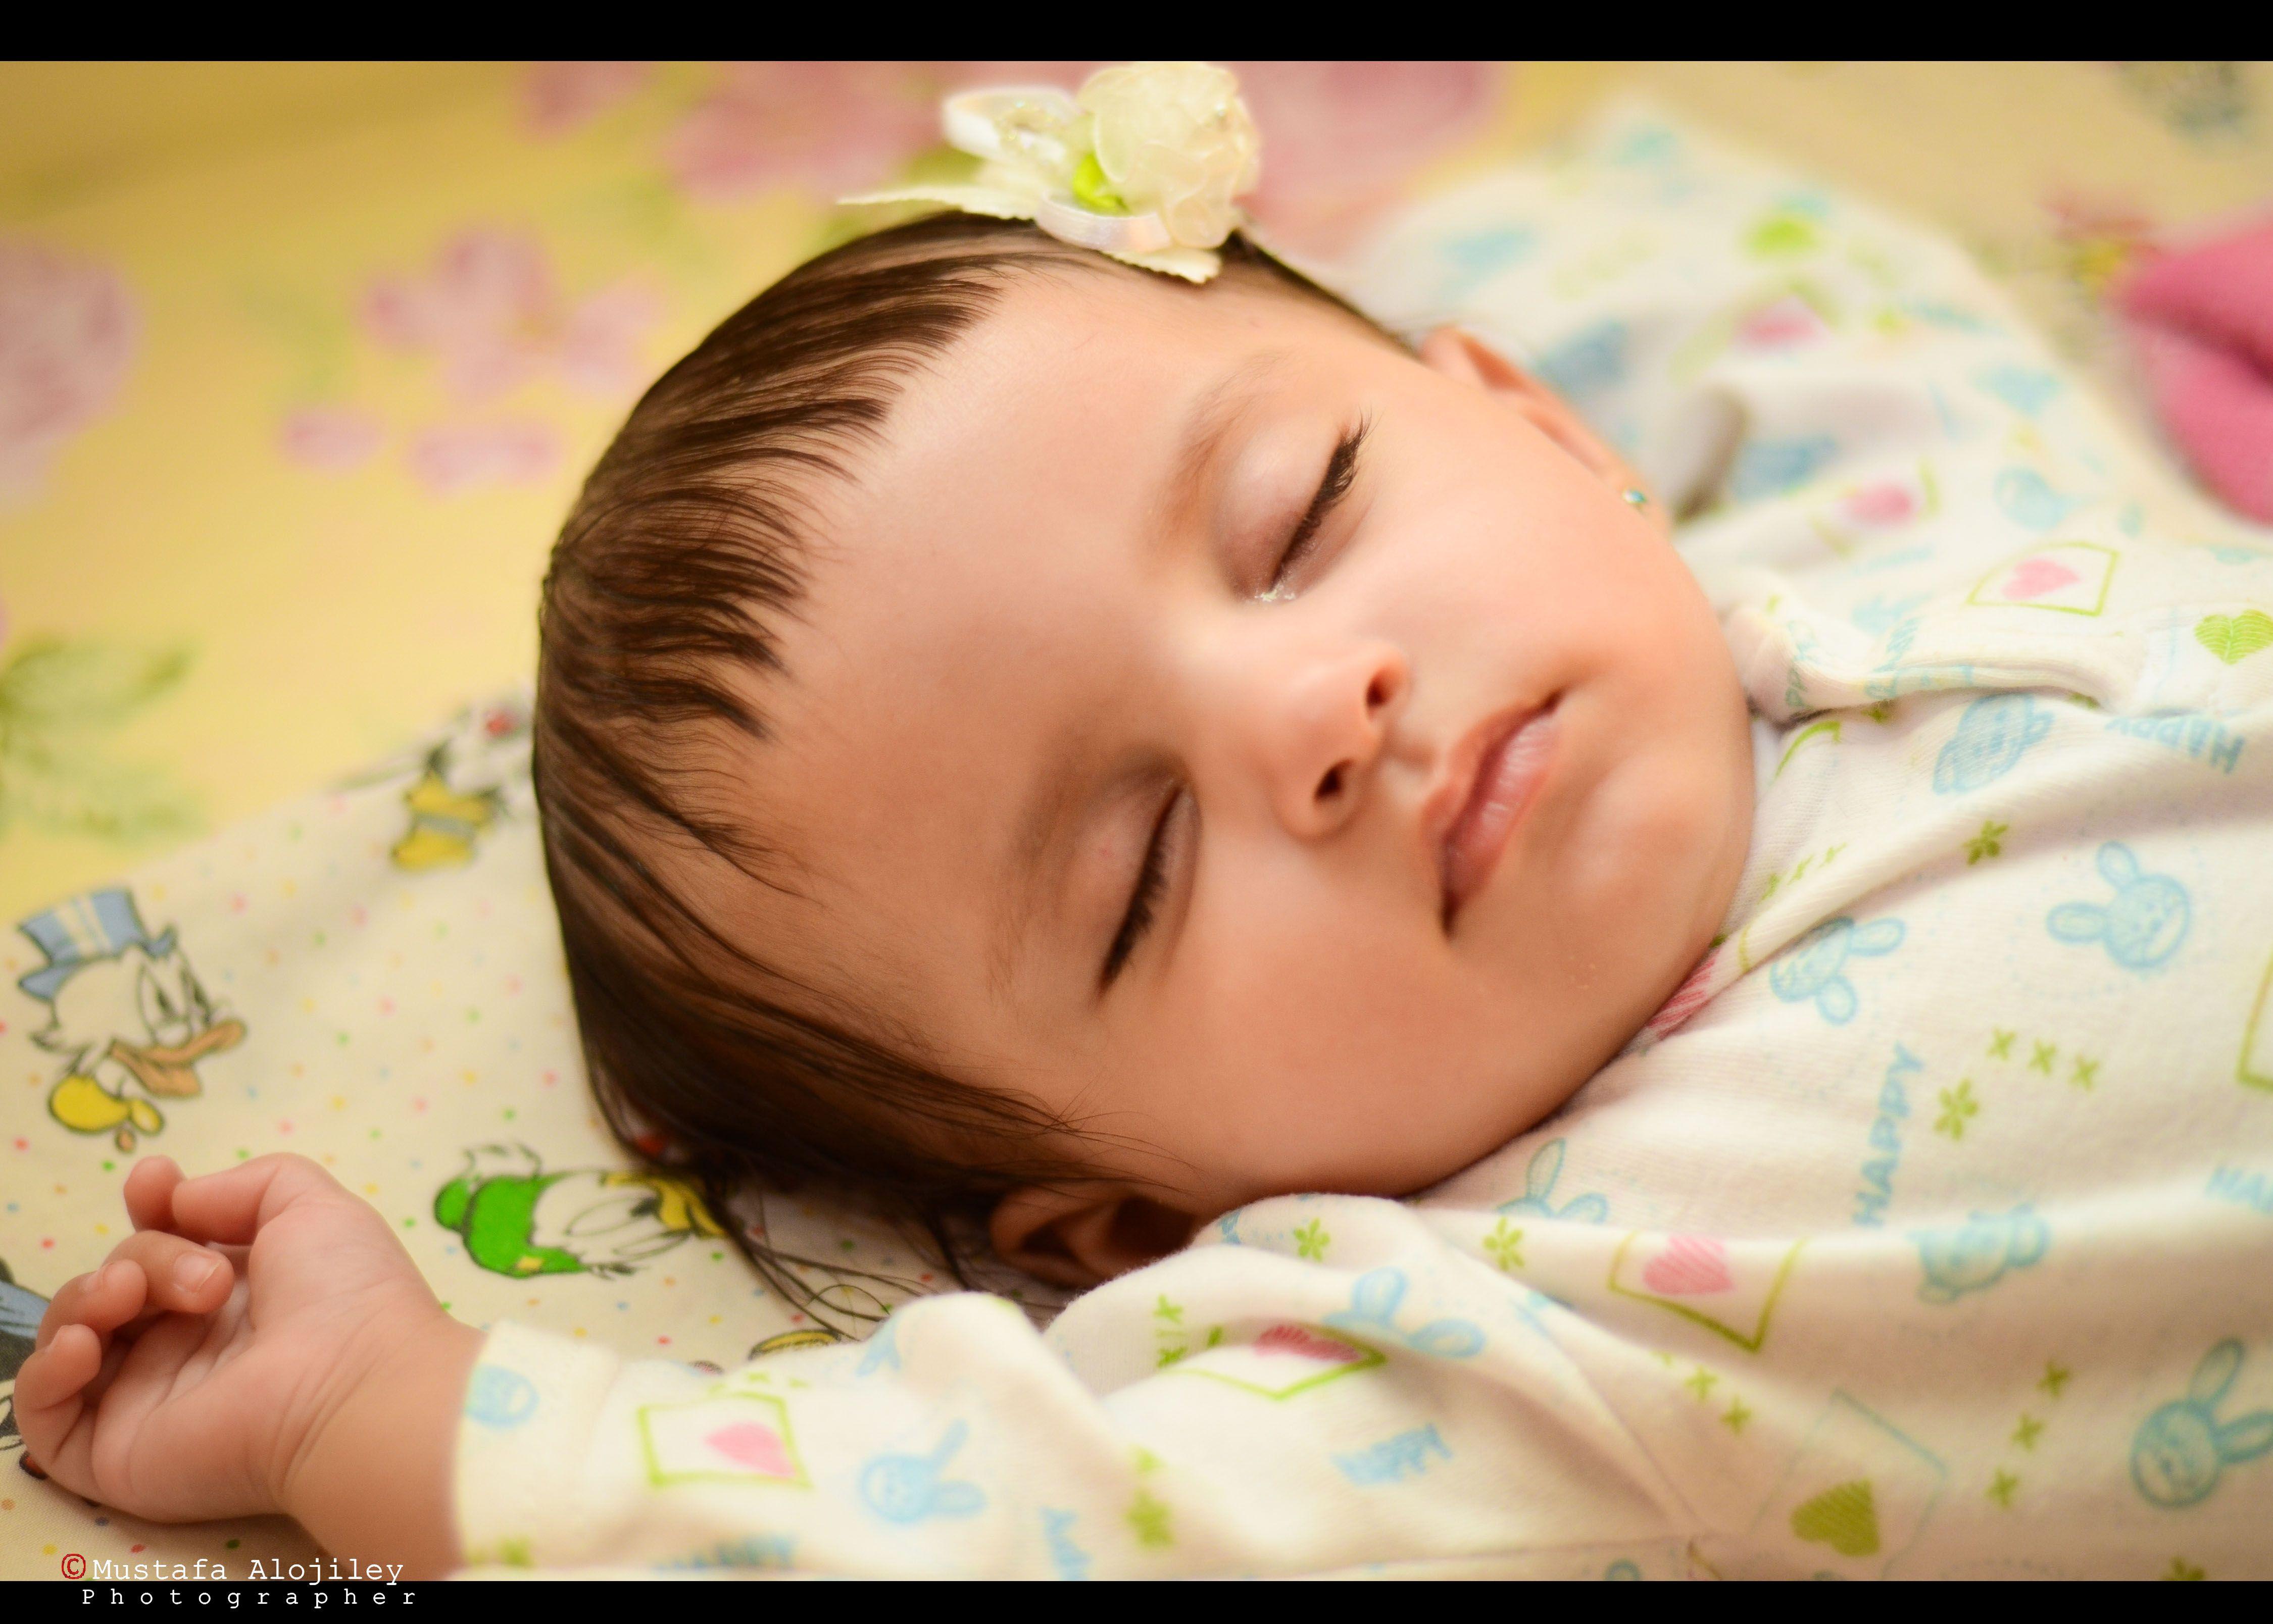 My Beautiful Baby Renad Beautiful Babies Baby Face Beautiful